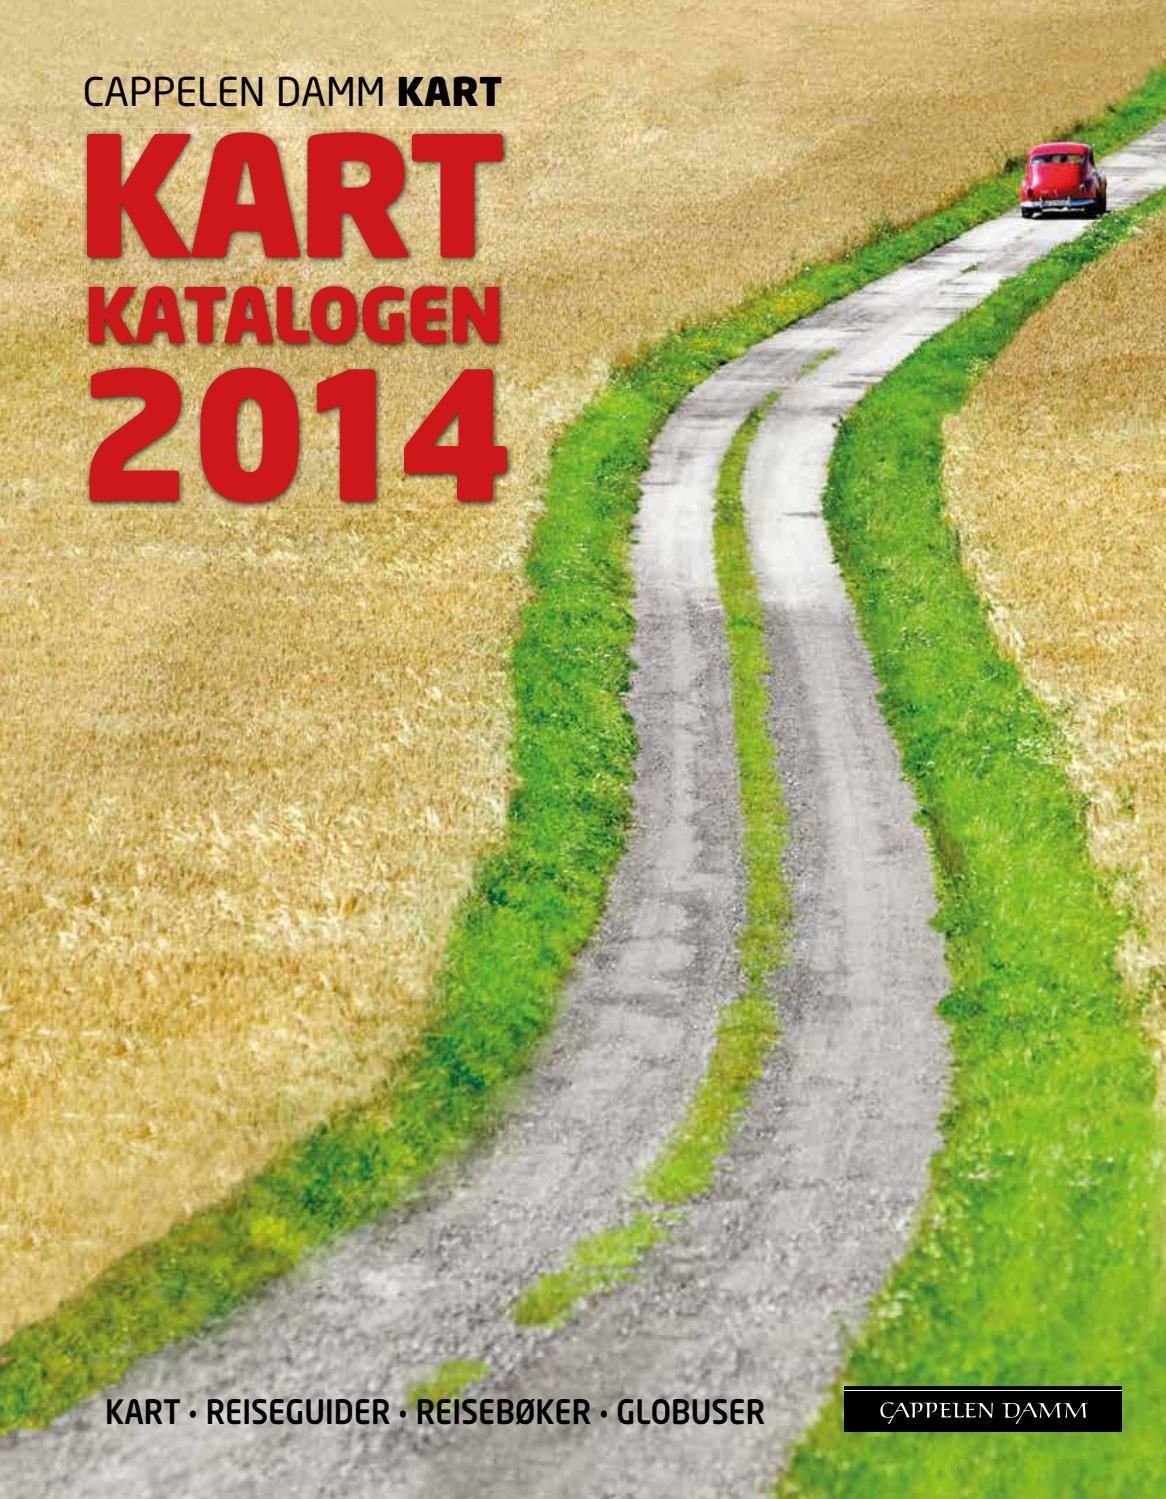 Kartkatalog2014 by Cappelen Damm AS - issuu